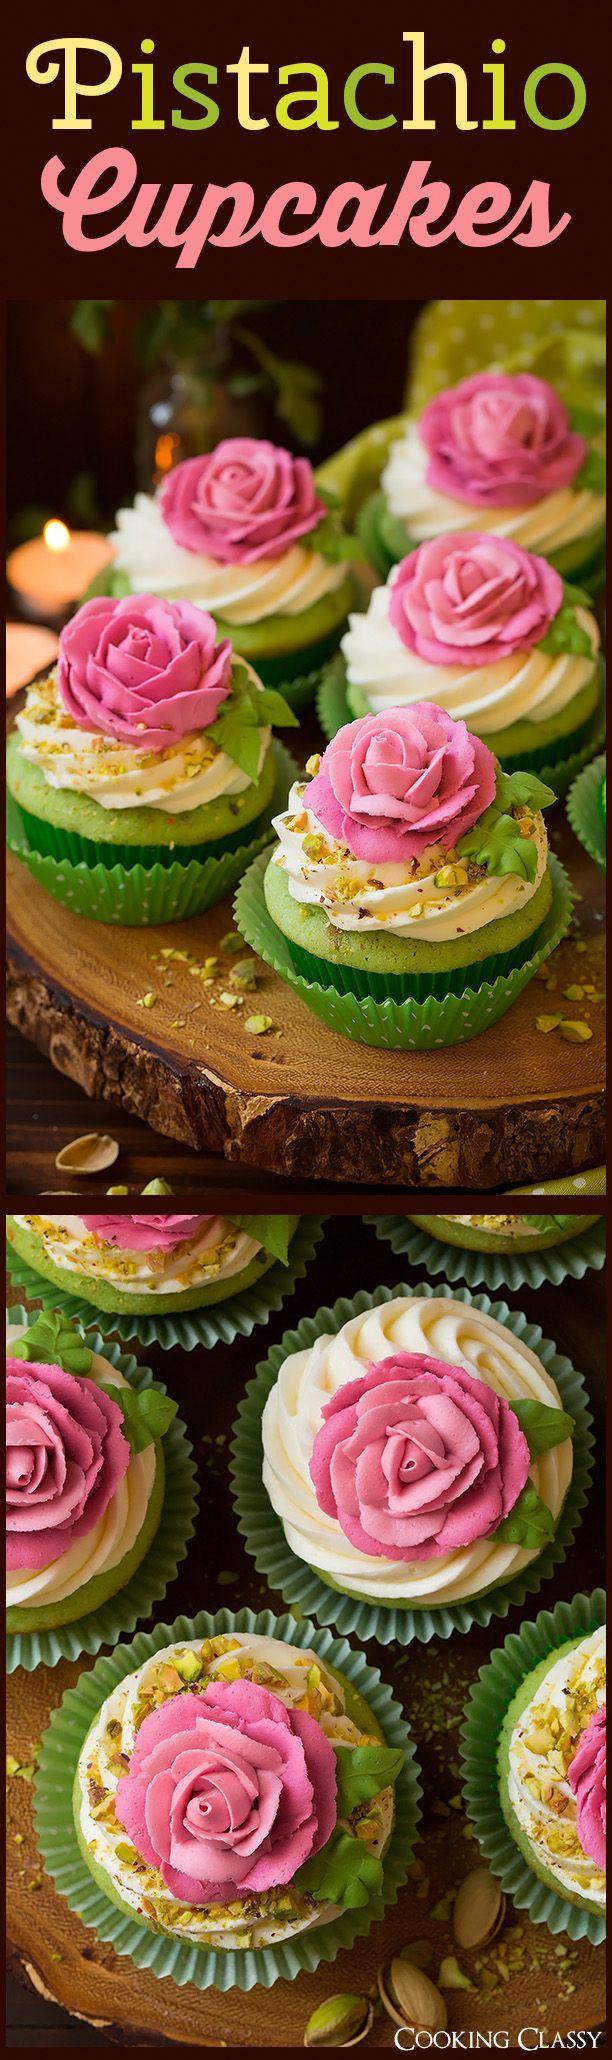 Pistachio Cupcakes - Cooking Classy